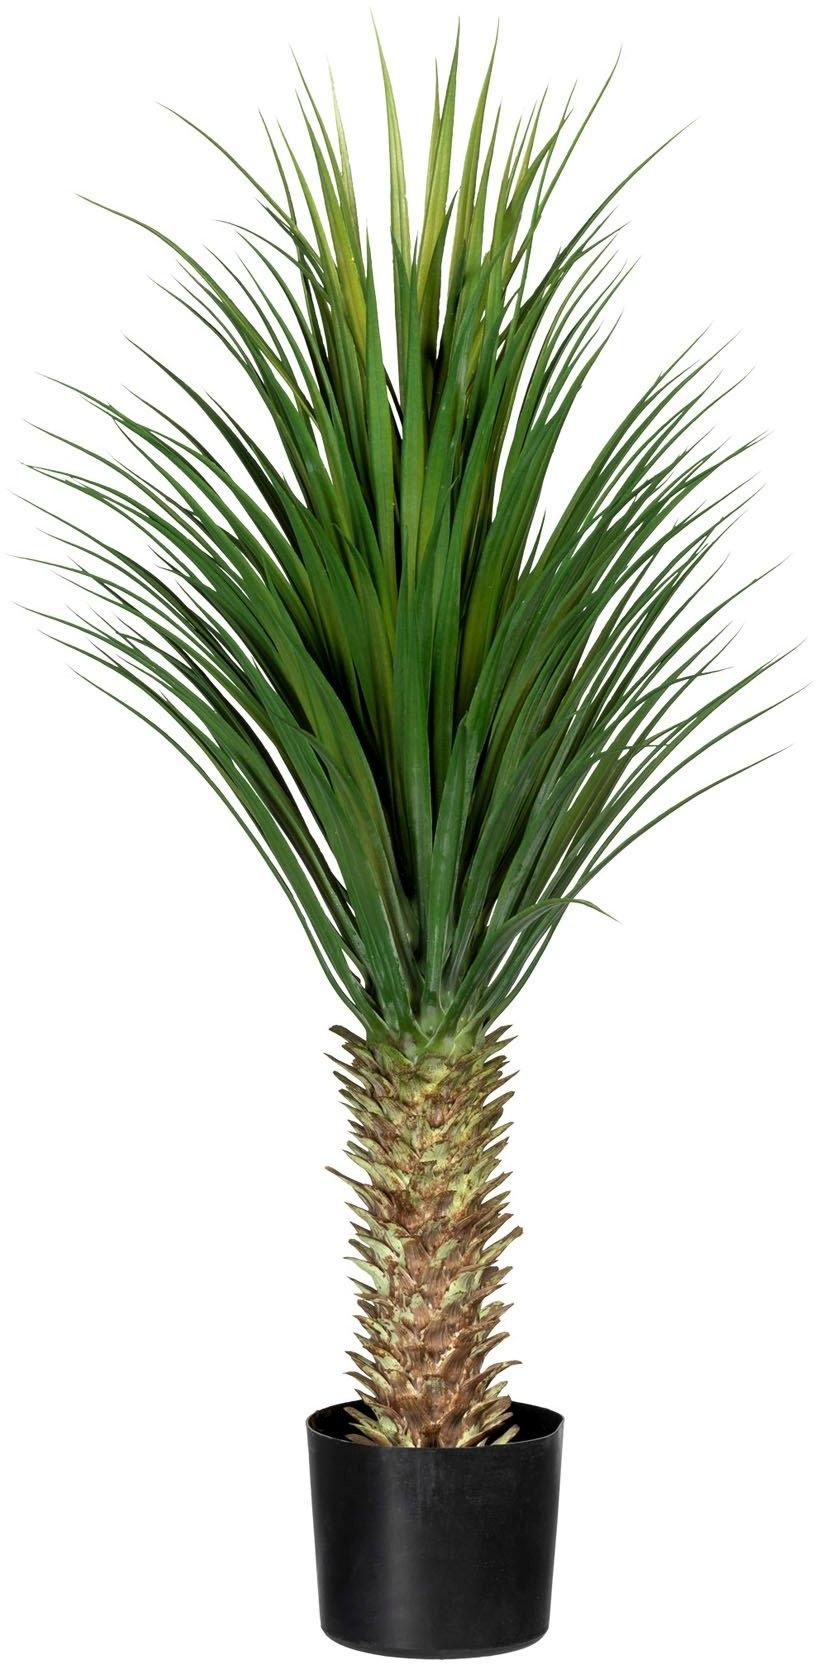 Creativ green Kunst-potplanten Yucca filamentosa (1 stuk) veilig op otto.nl kopen